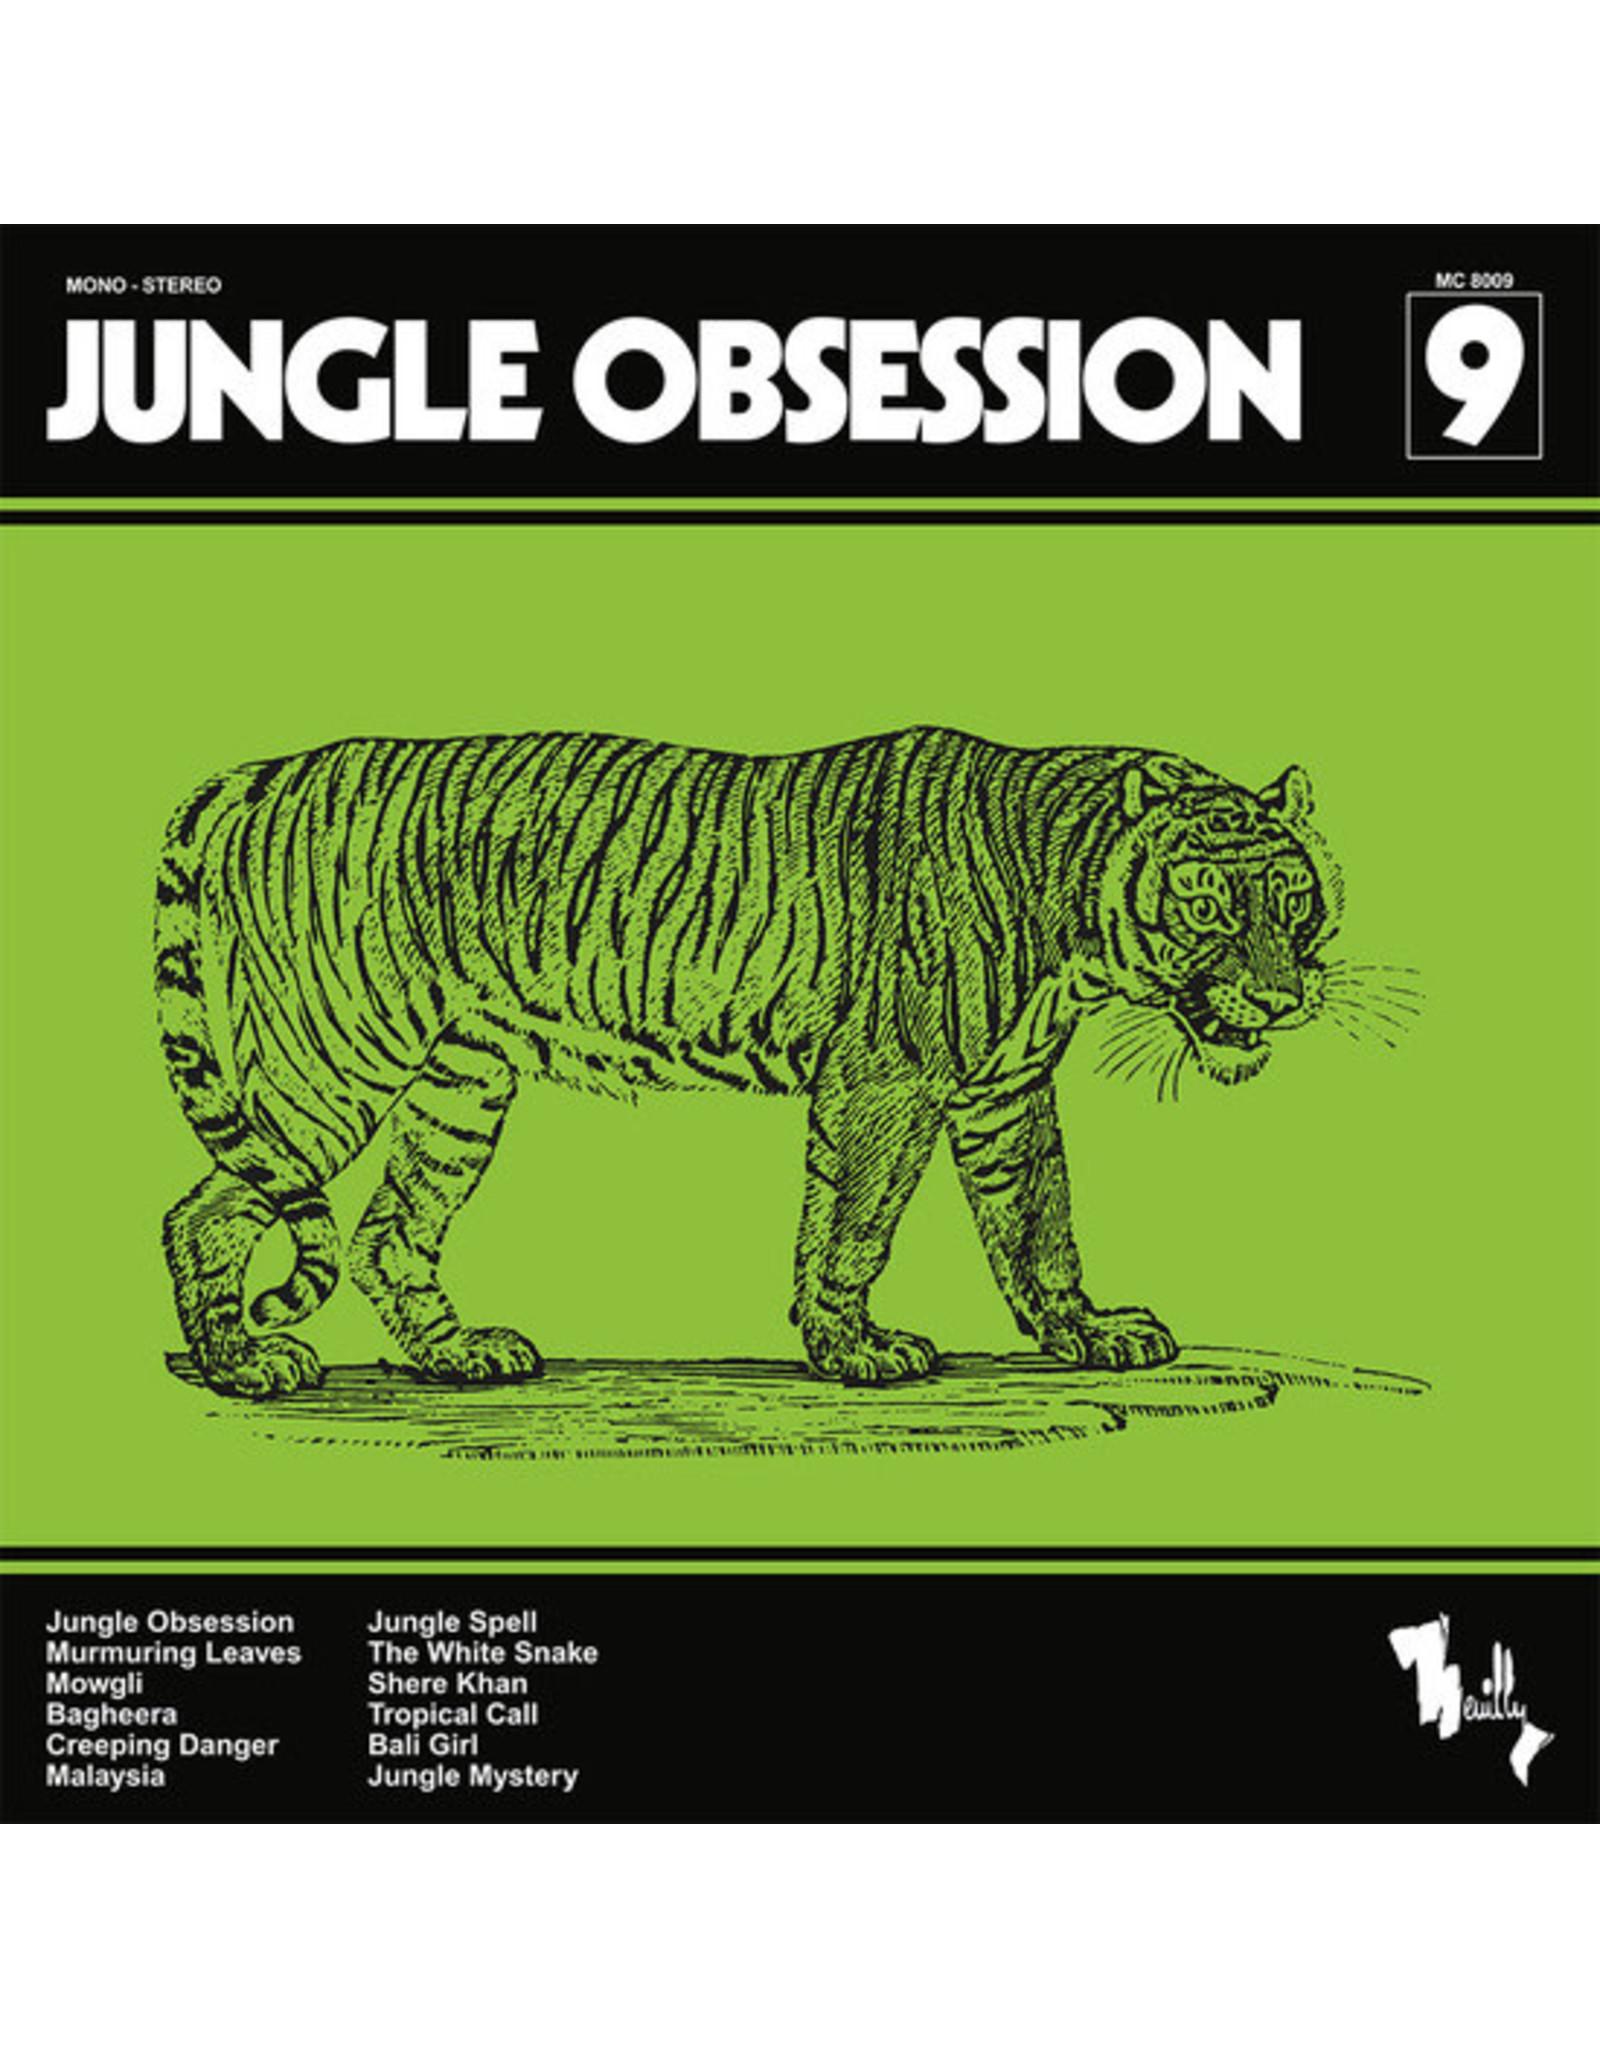 Farfalla Nardini, Nino and Roger Roger: Jungle Obsession LP